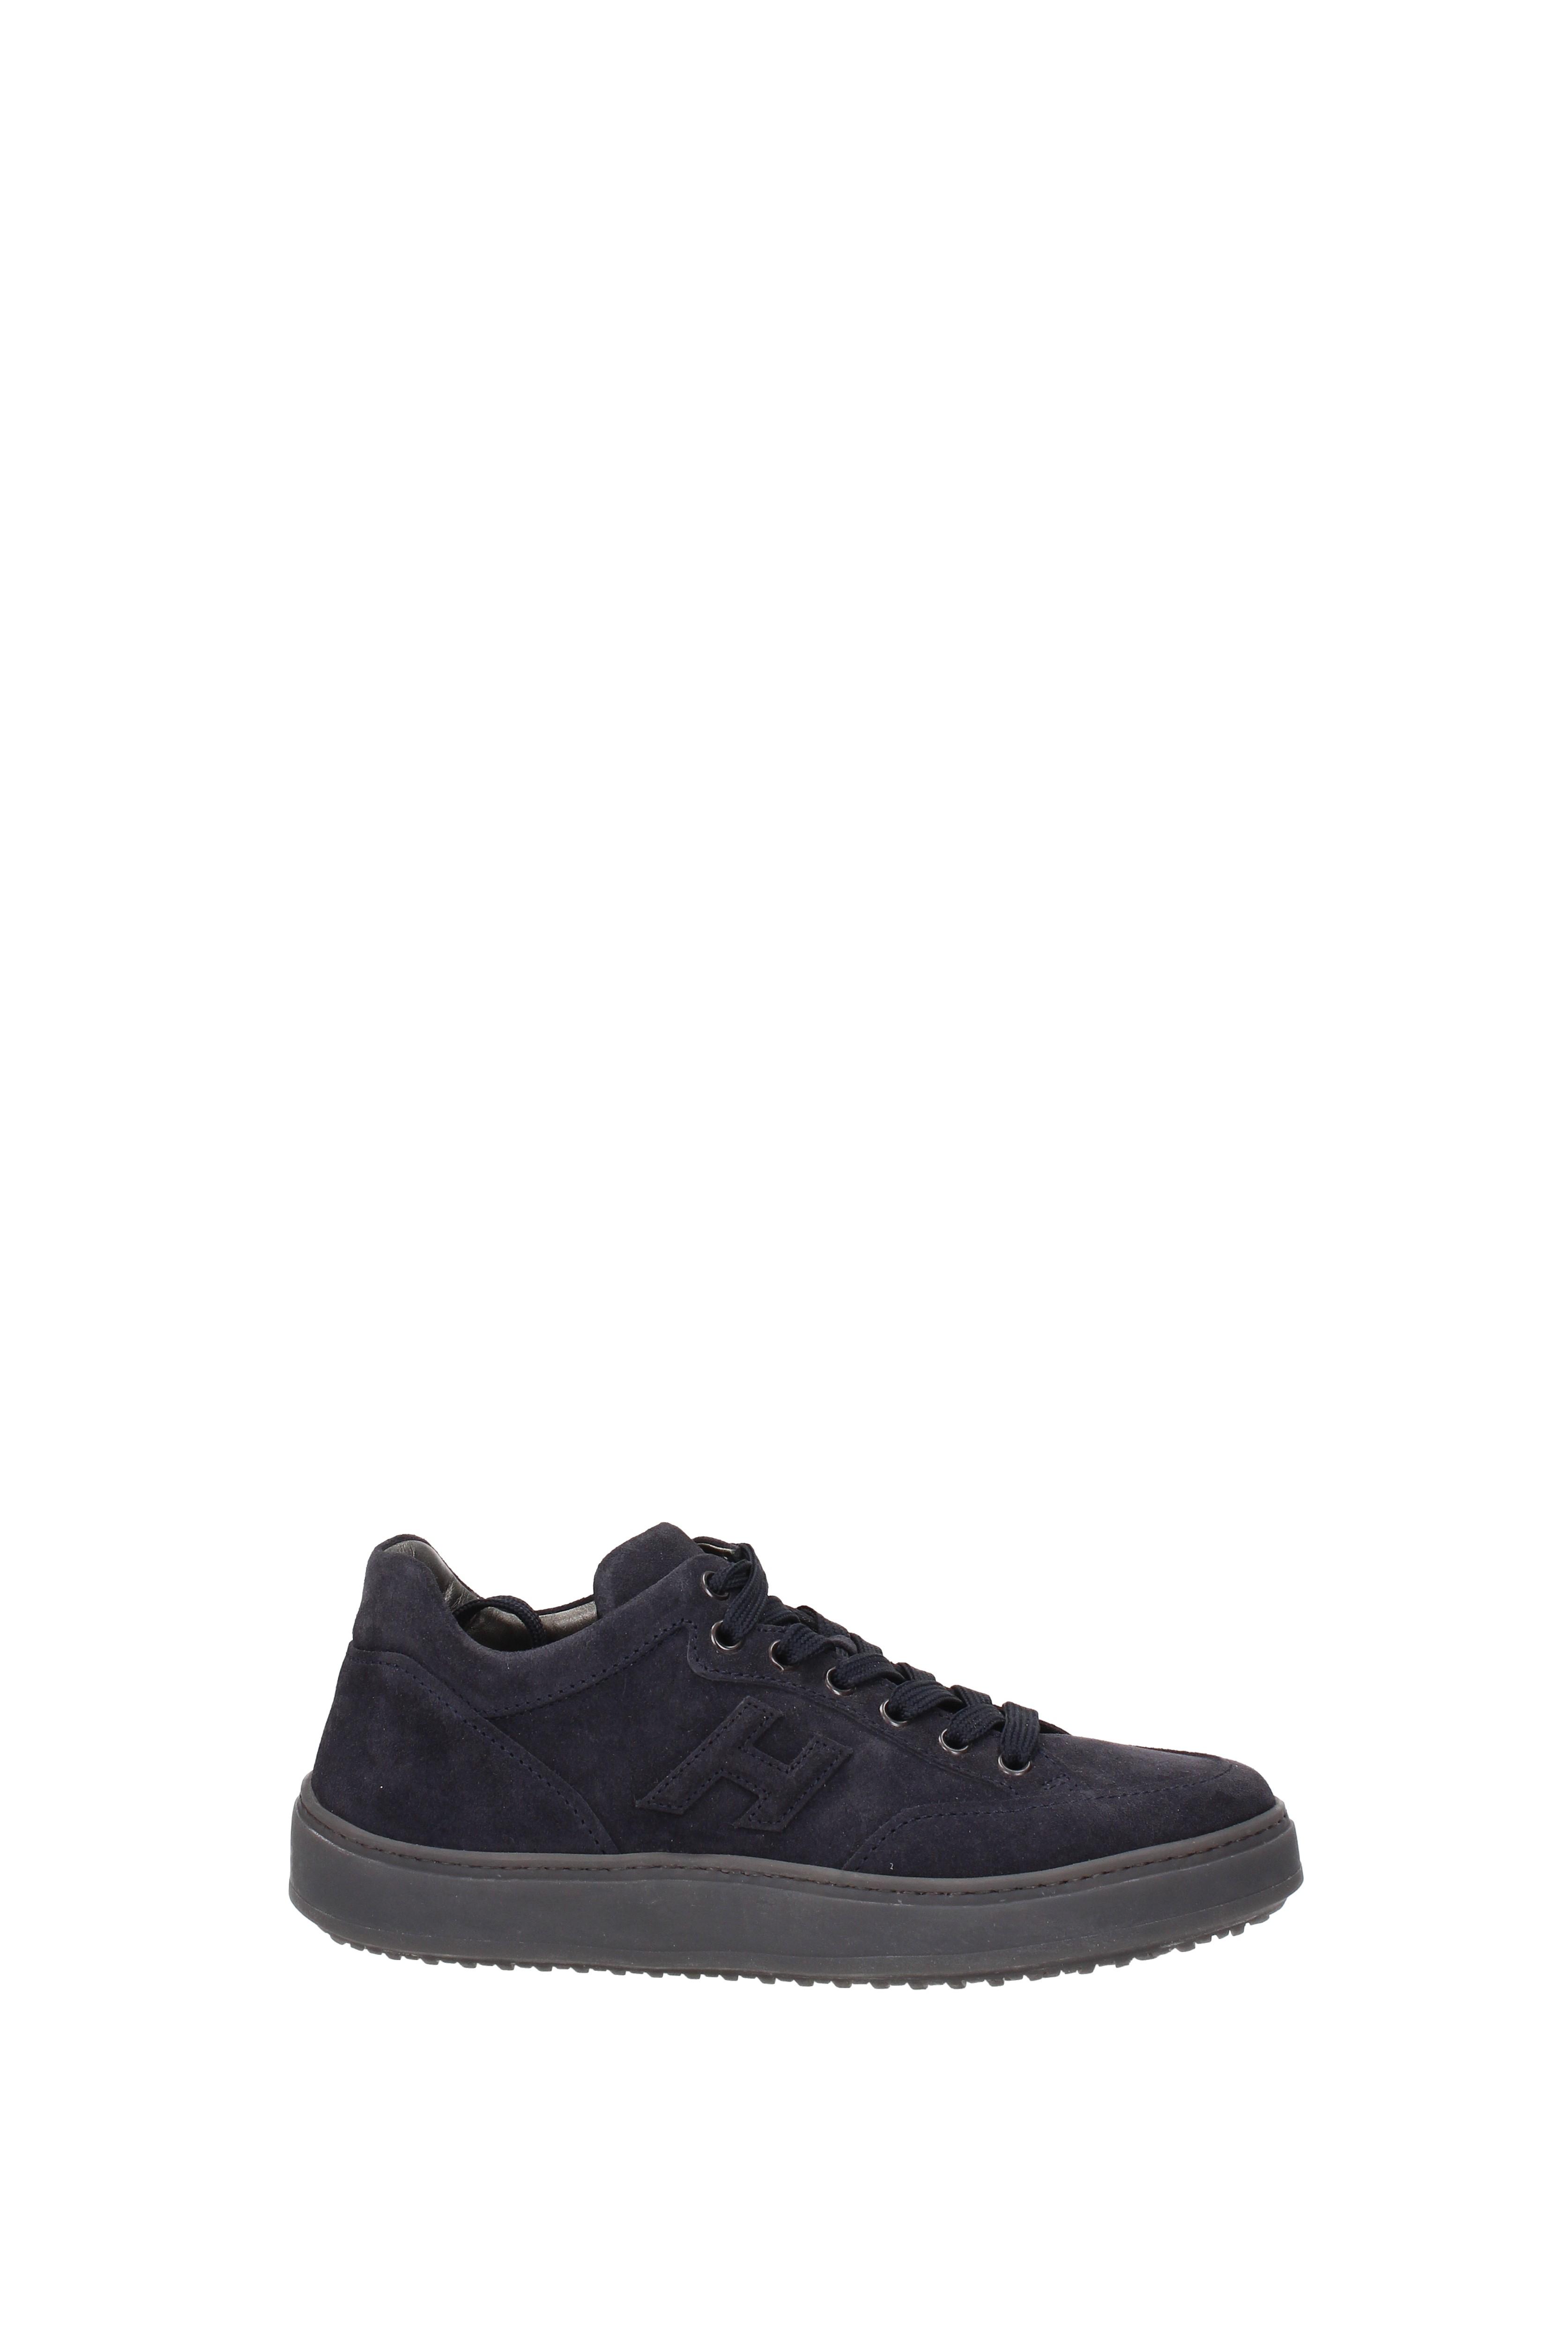 Sneakers (HXM3020W560HG0) Hogan Herren - Wildleder (HXM3020W560HG0) Sneakers 22754f